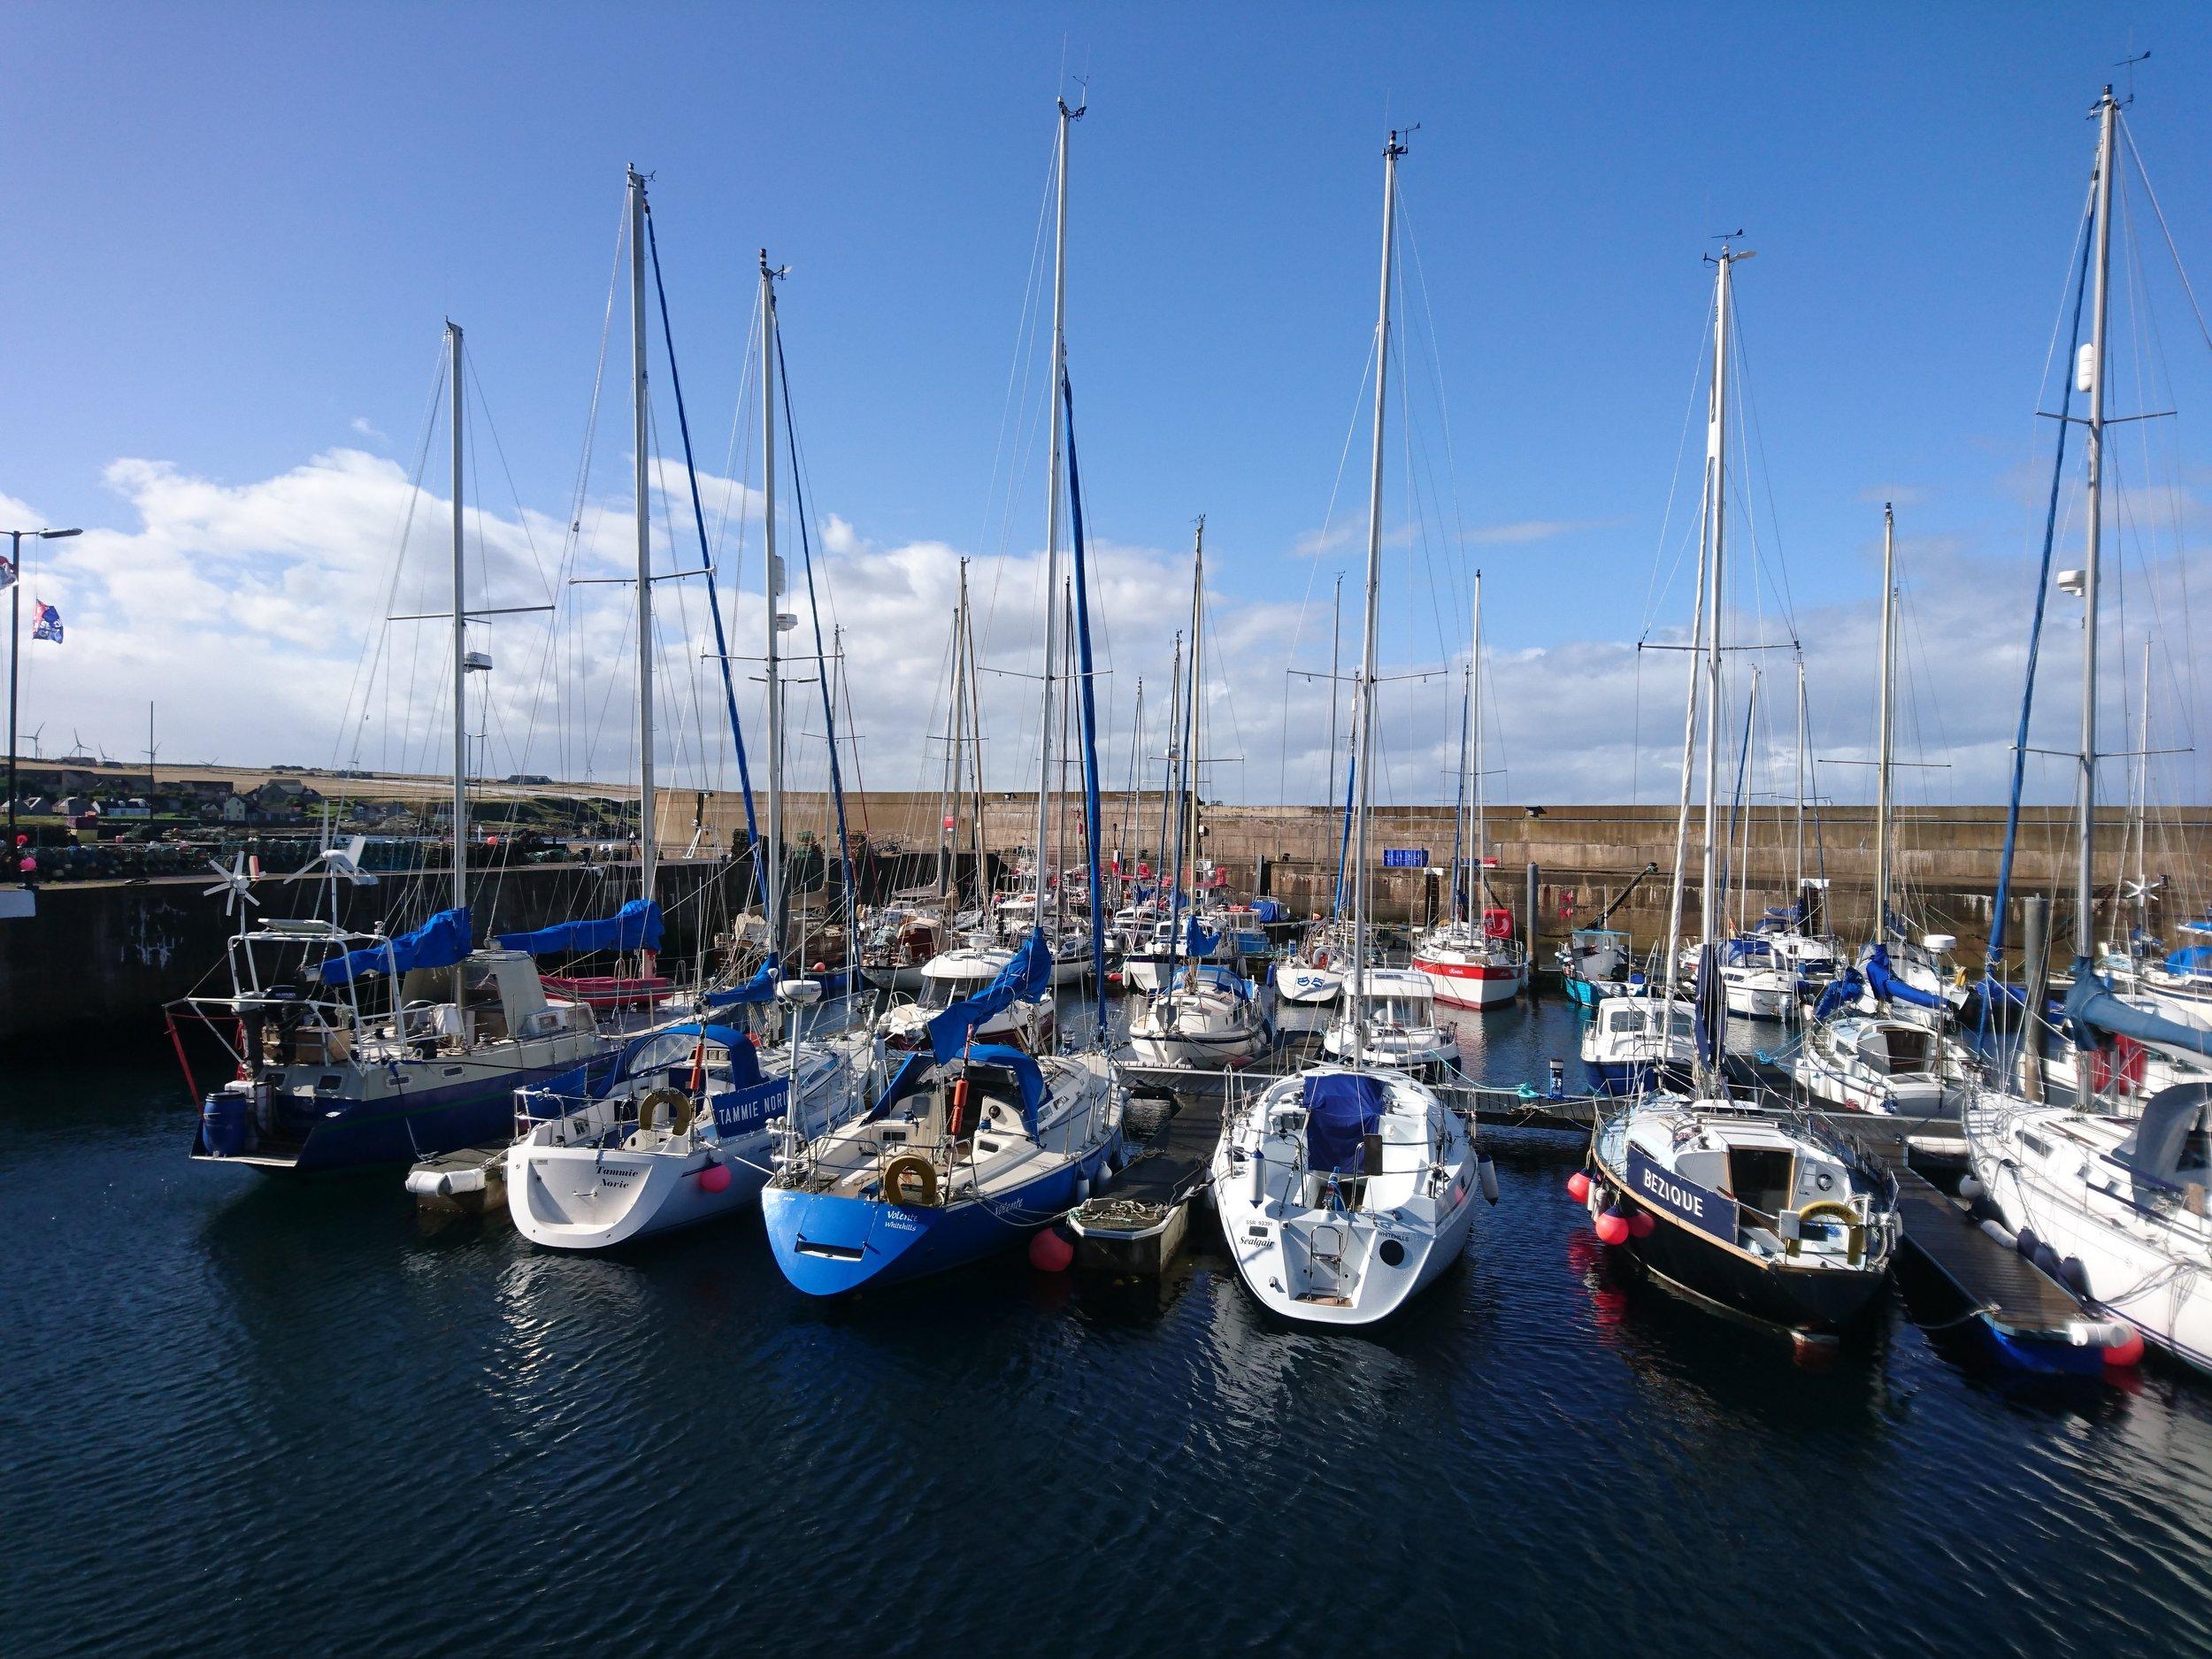 Whitehills Harbour